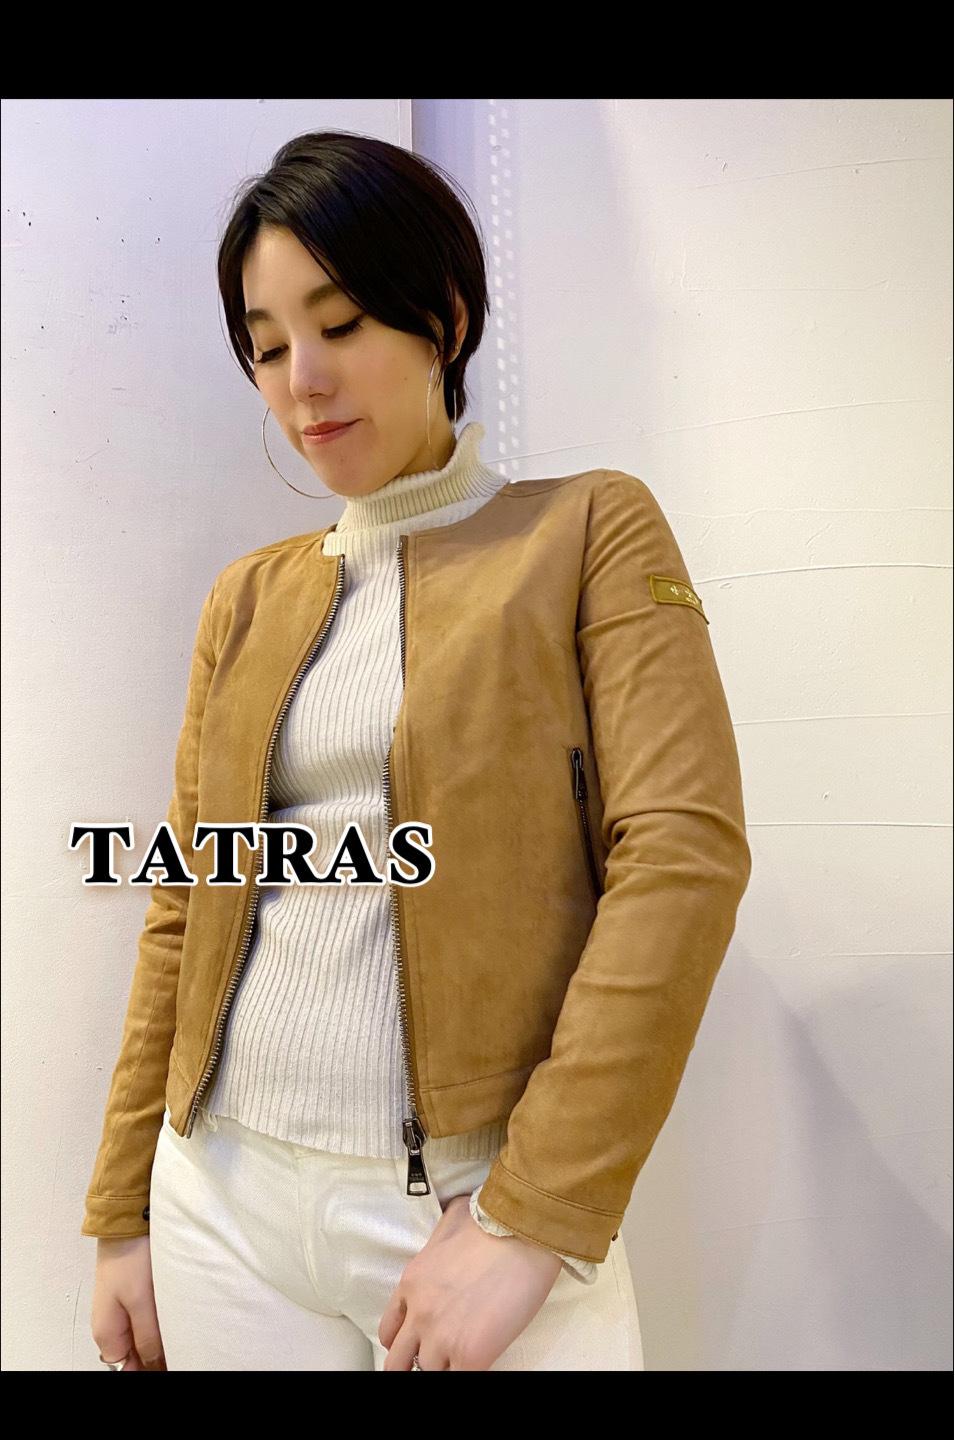 20SS「TATRAS  タトラス」ノーカラーブルゾン【TALETA】入荷です♪_c0204280_13140985.jpg